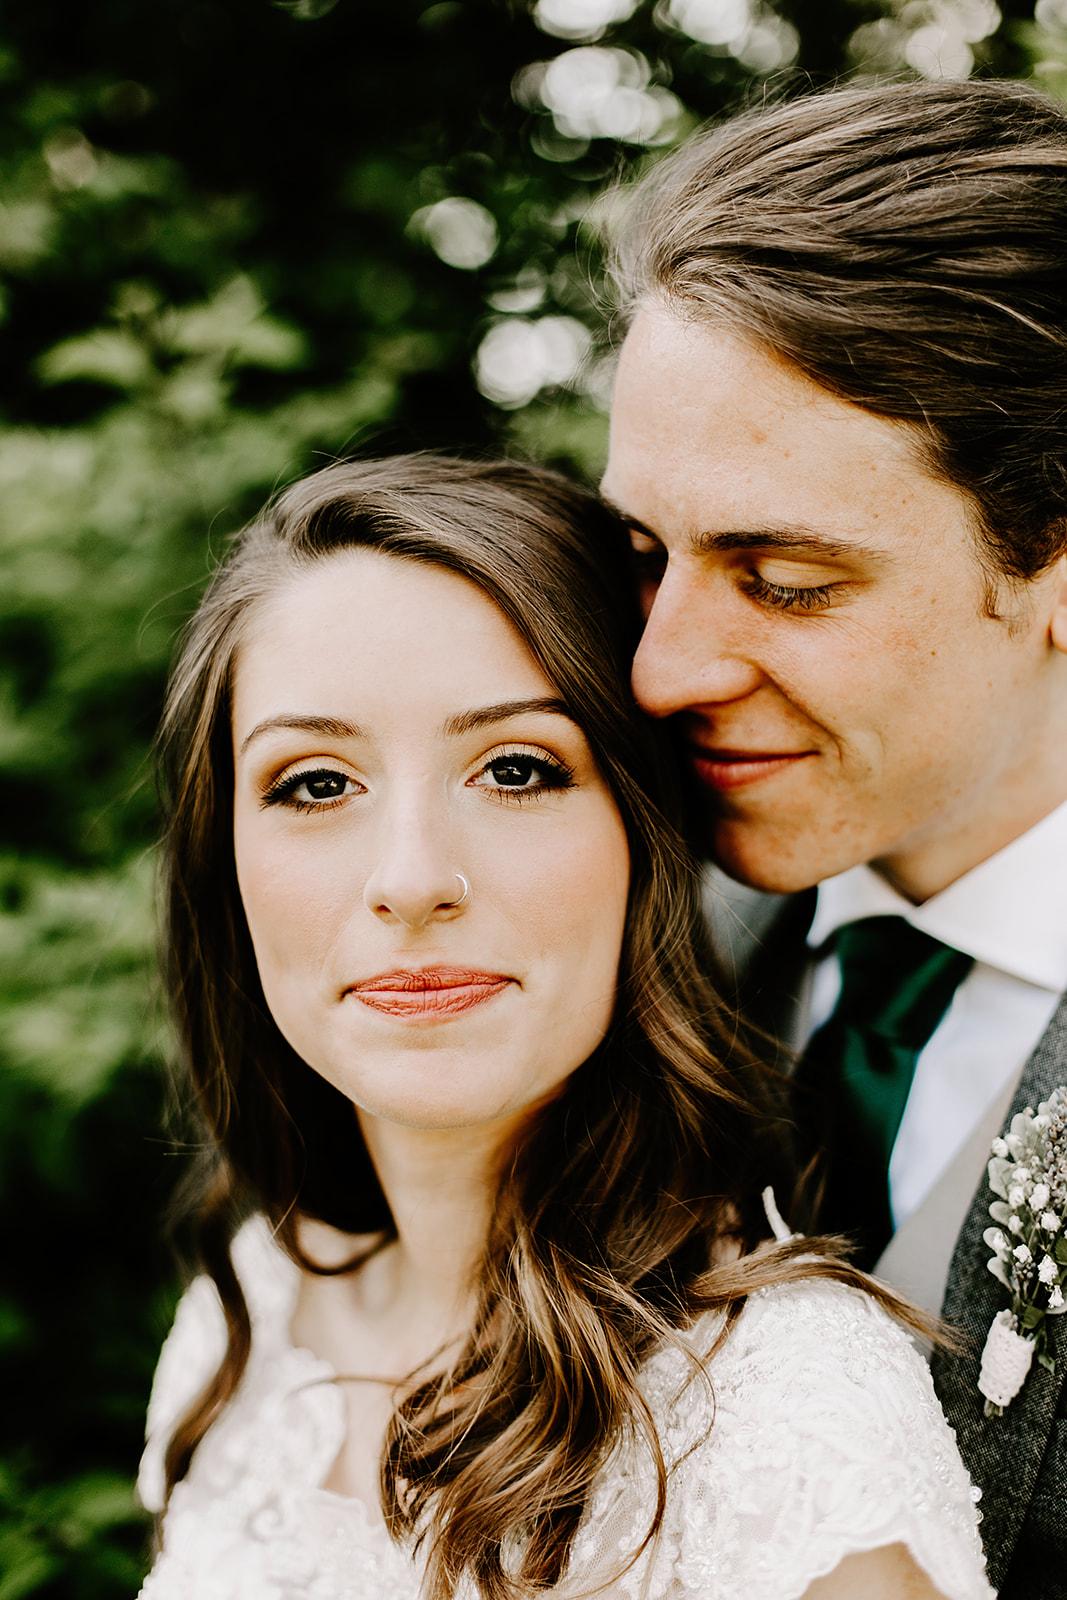 Lily and Easton Wedding Carmel Indiana Cool Creek Park Grace Church Emily Elyse Wehner Photography -144.jpg